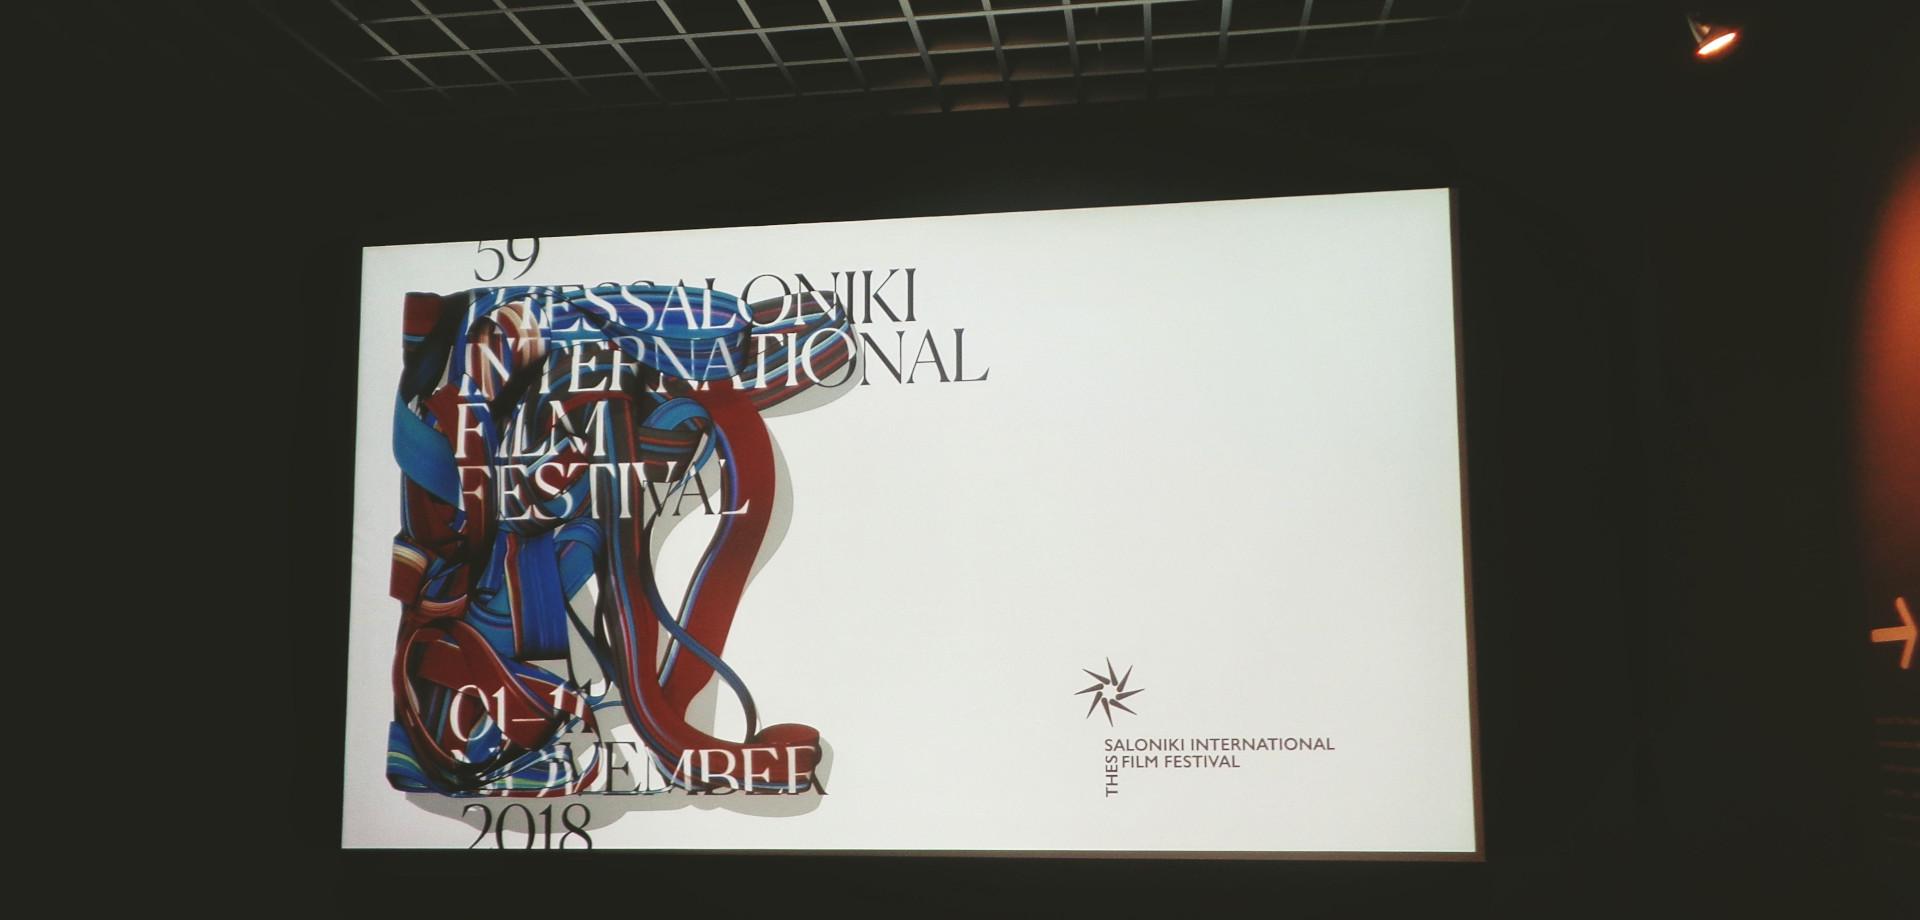 59o Φεστιβάλ Κινηματογράφου Θεσσαλονίκης